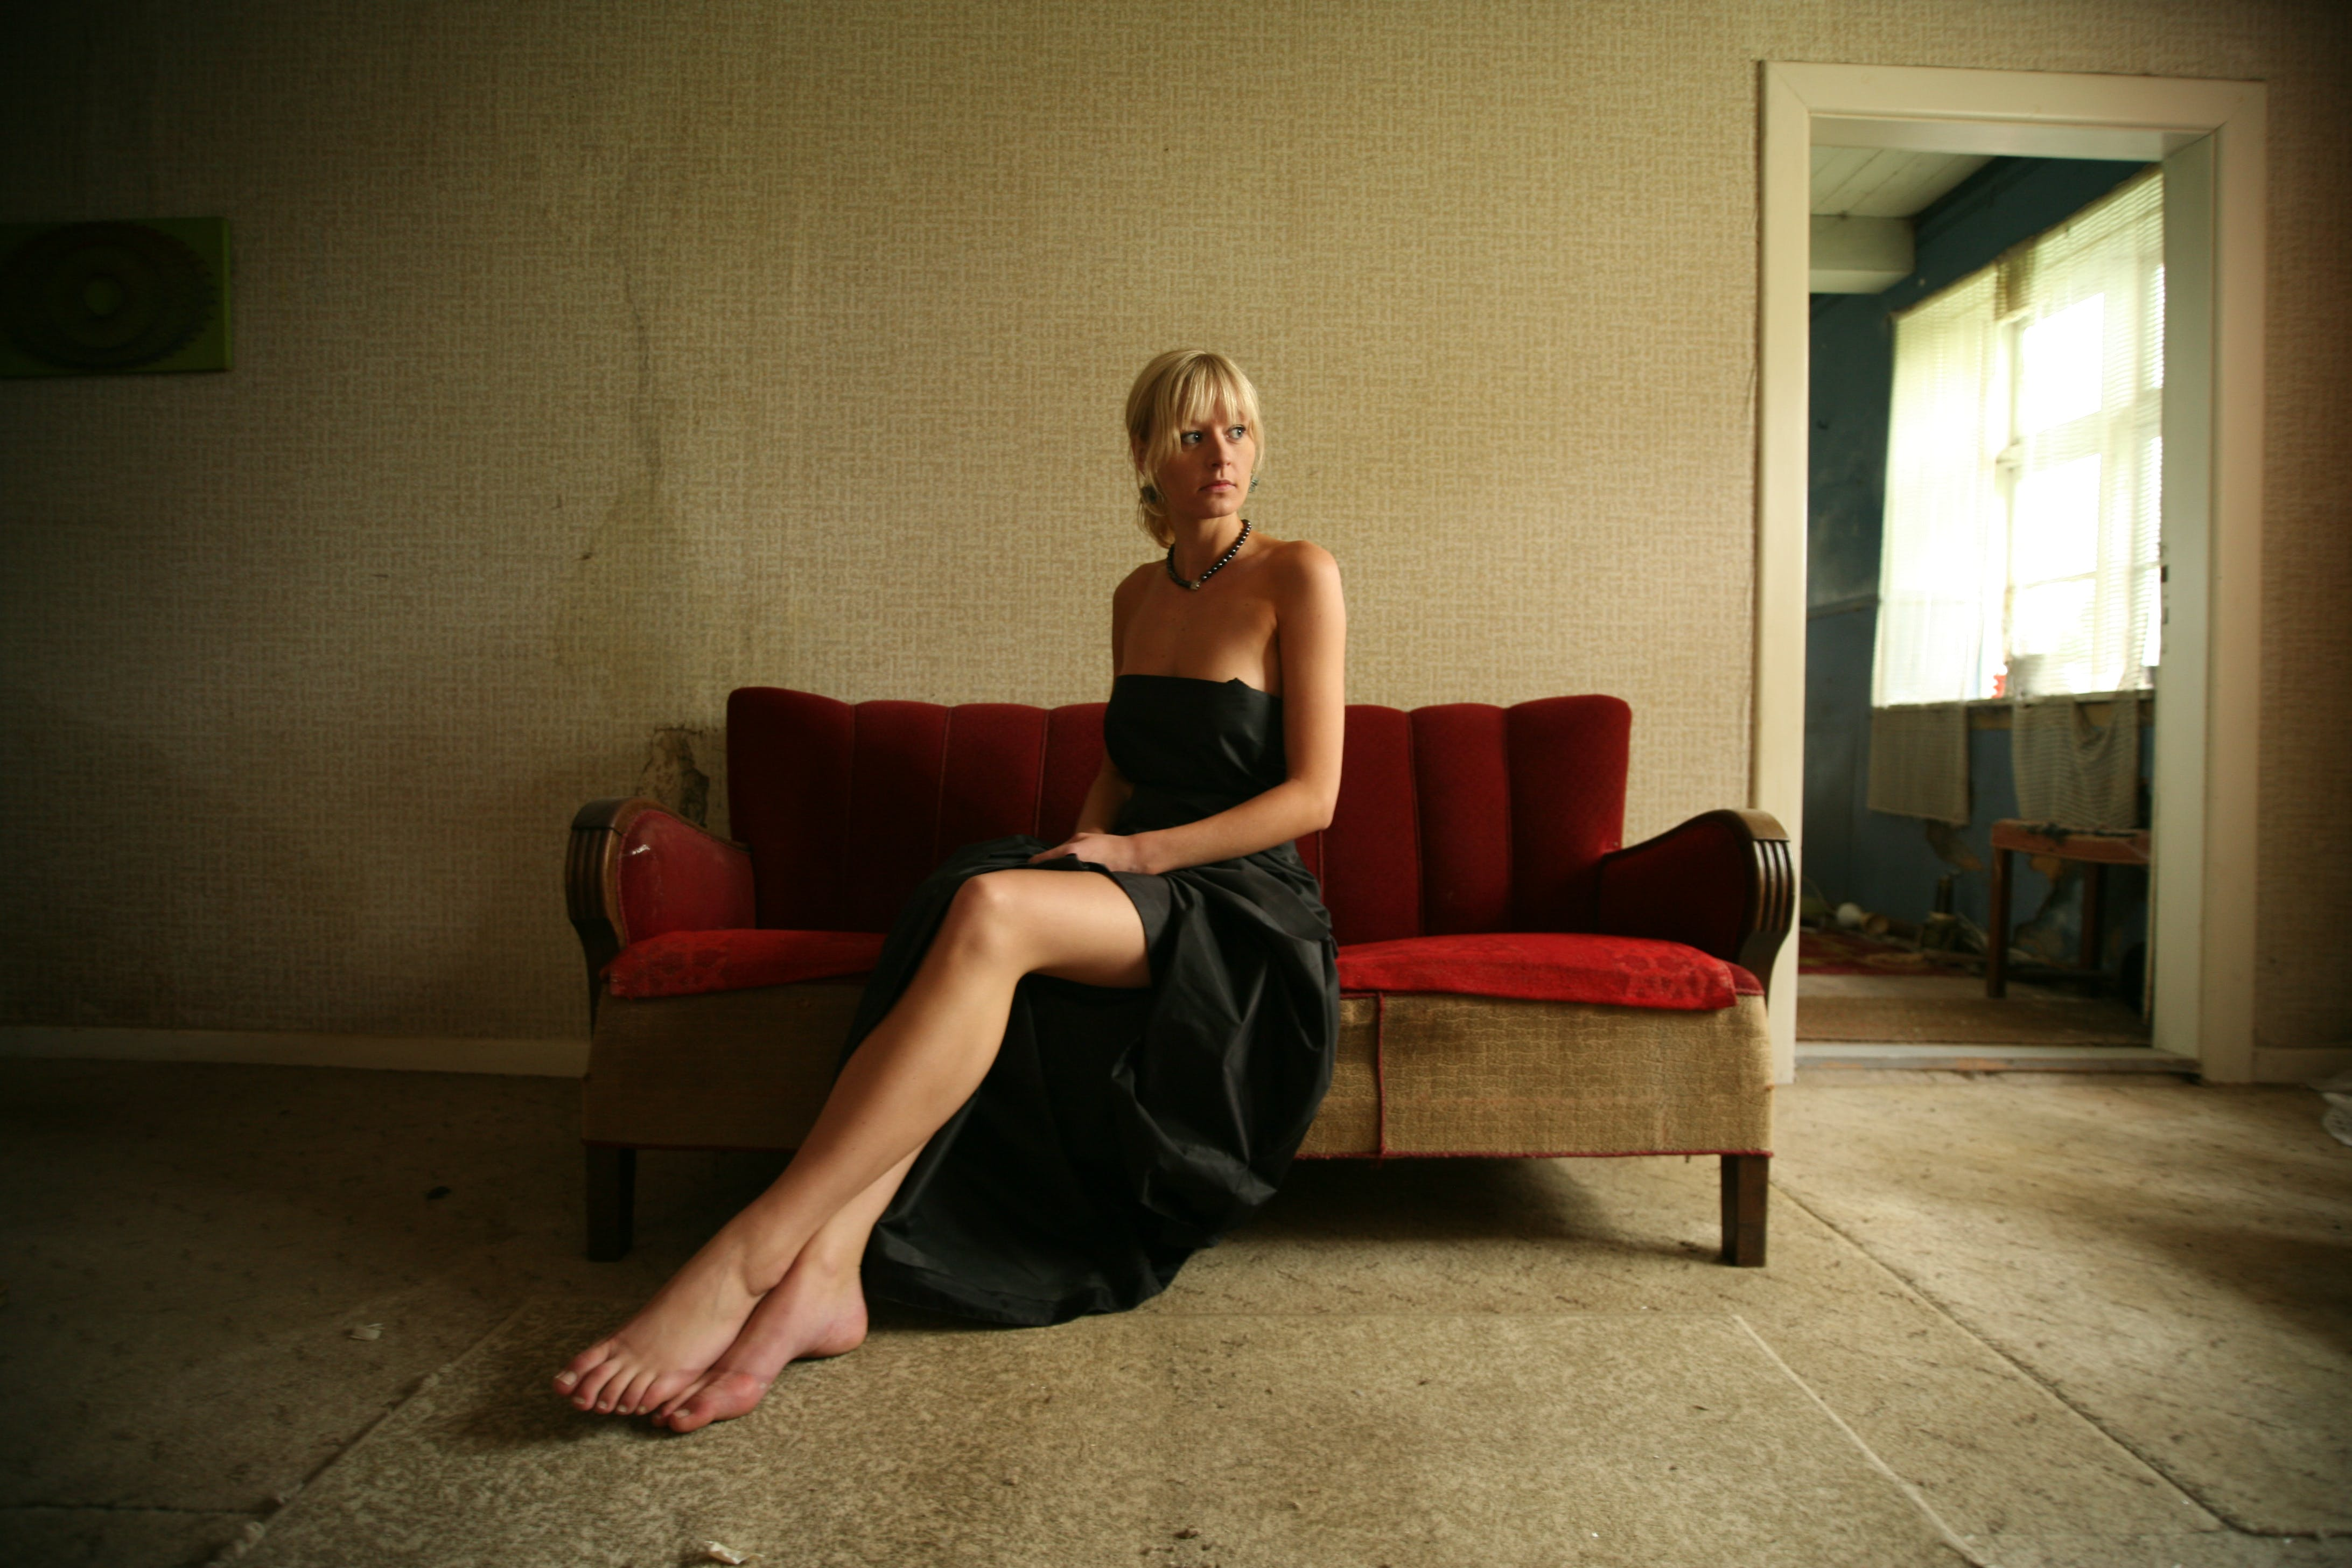 Woman Siting on Sofa Seat